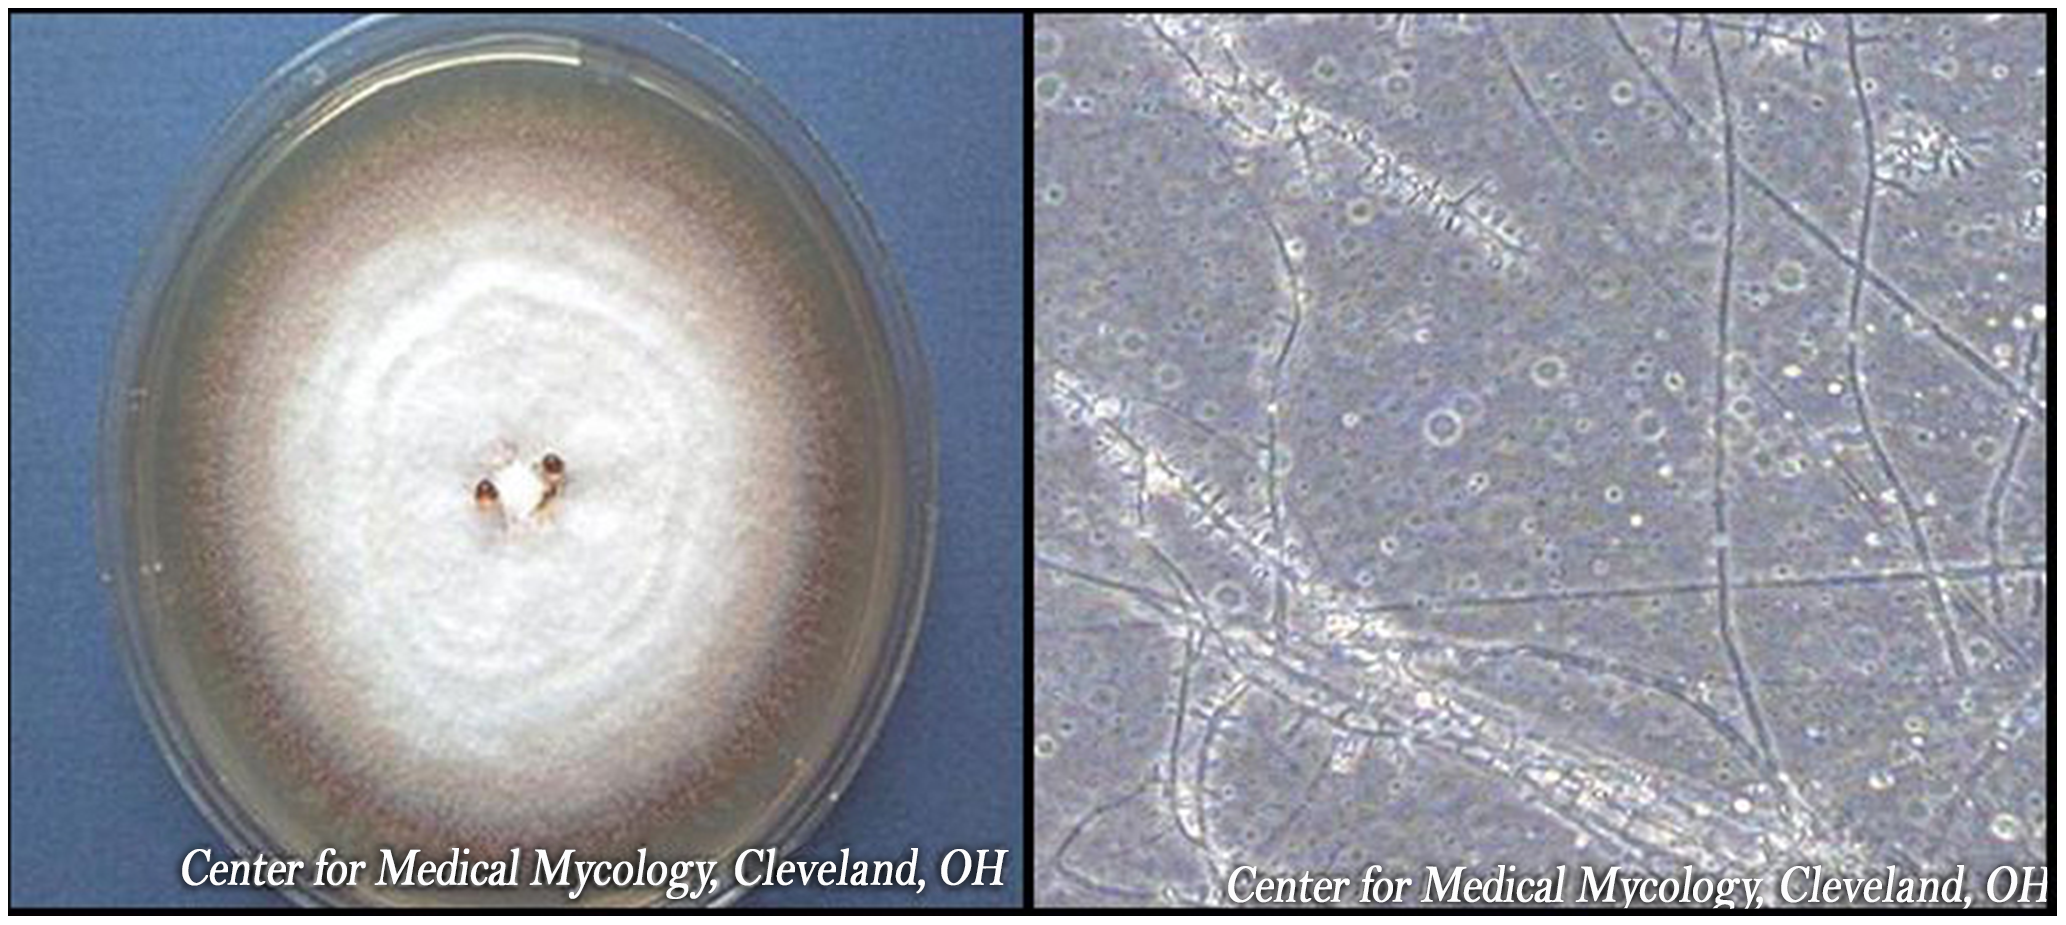 <i>Trichophyton rubrum</i> colony and microscopic appearance (40x).